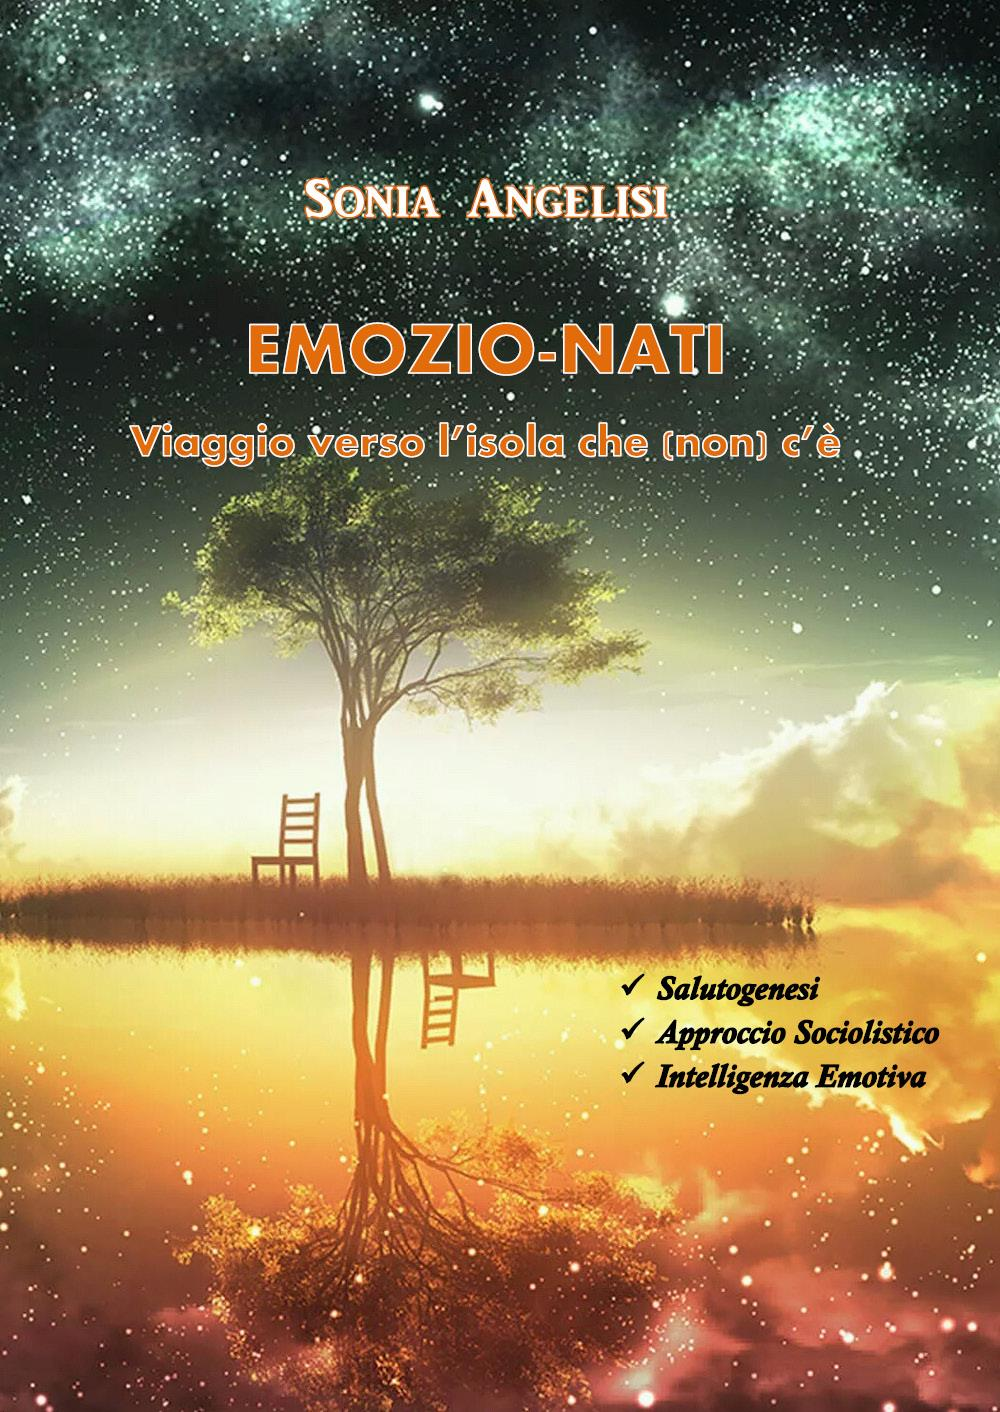 Emozio-nati